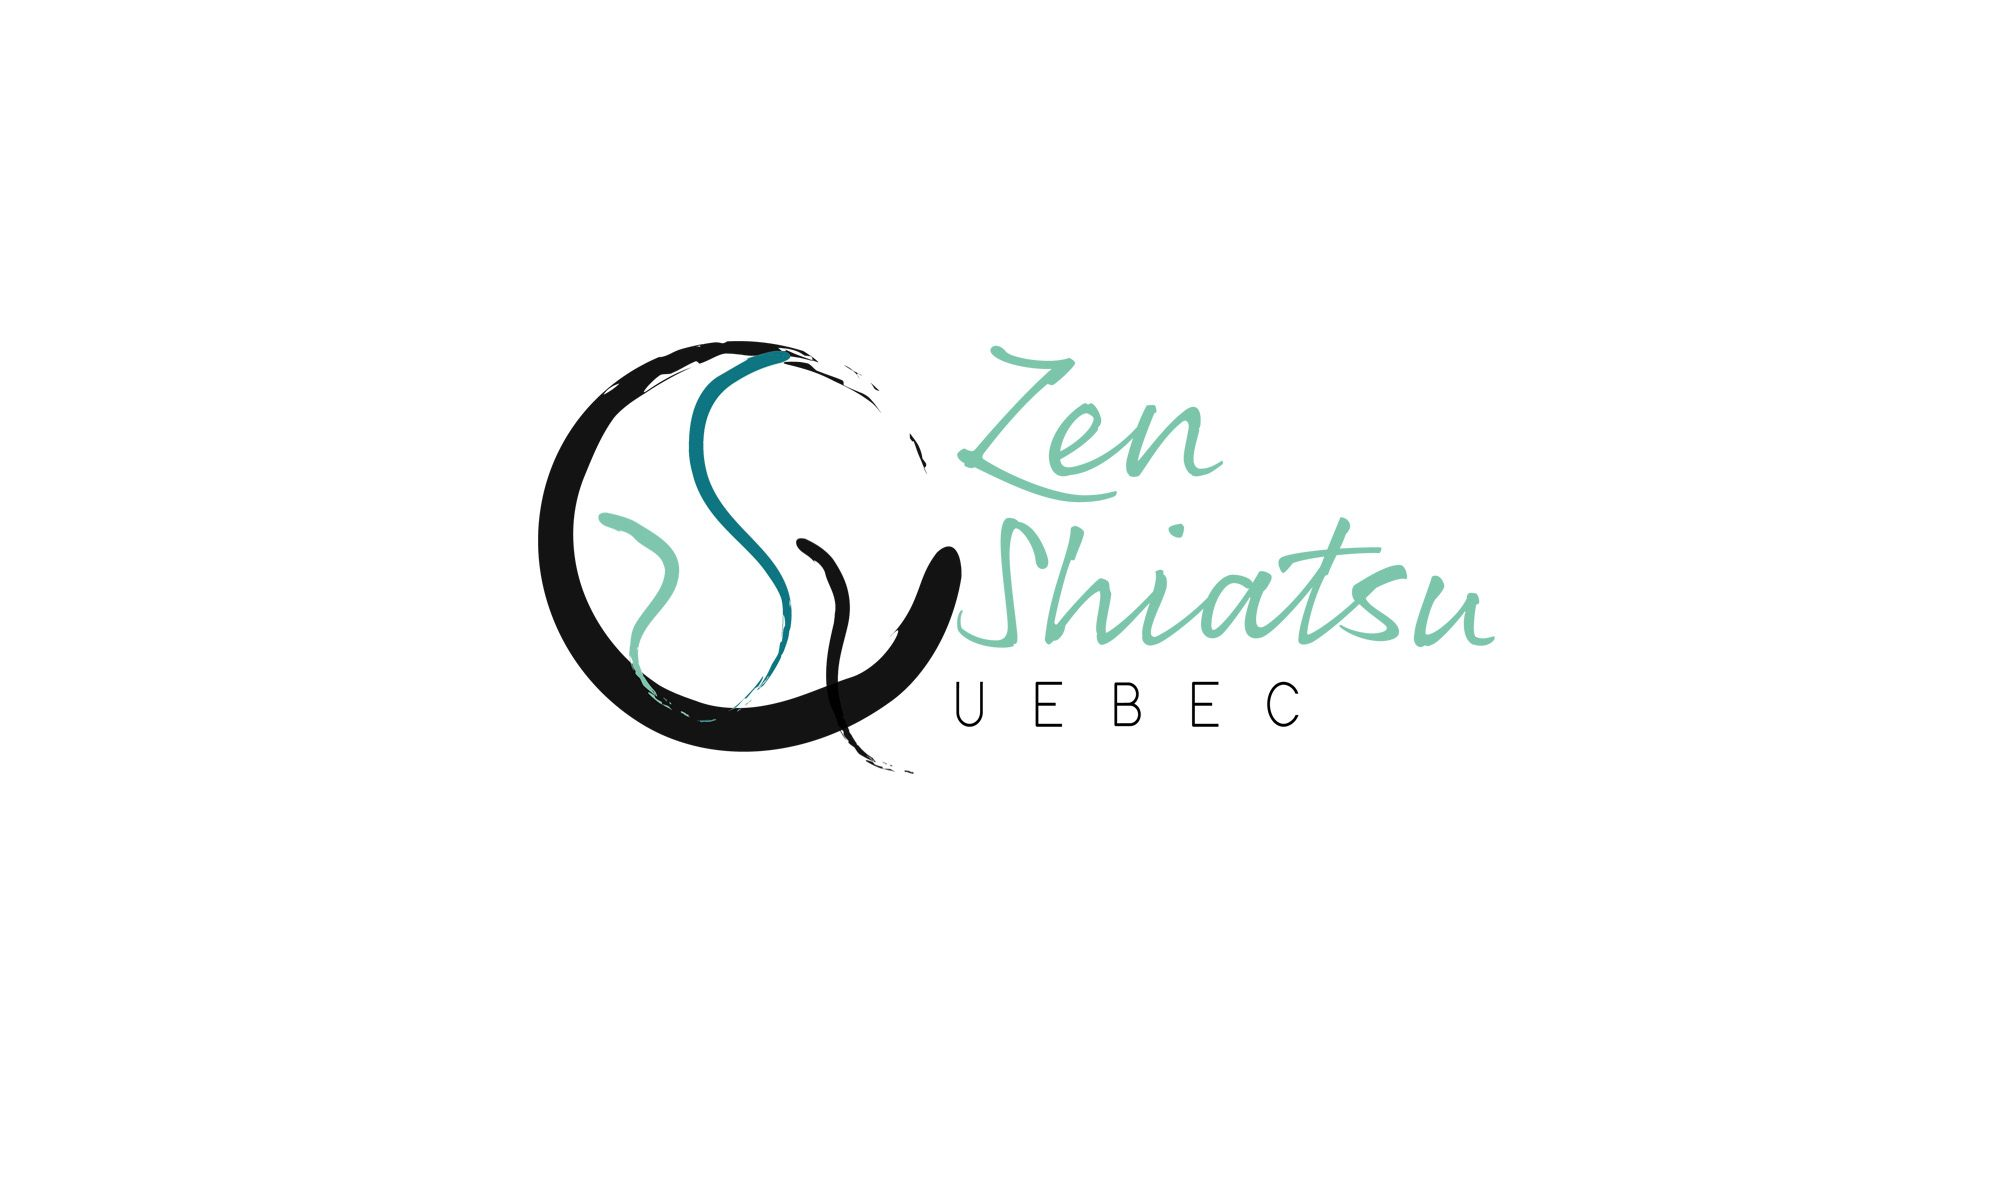 Zen Shiatsu Quebec